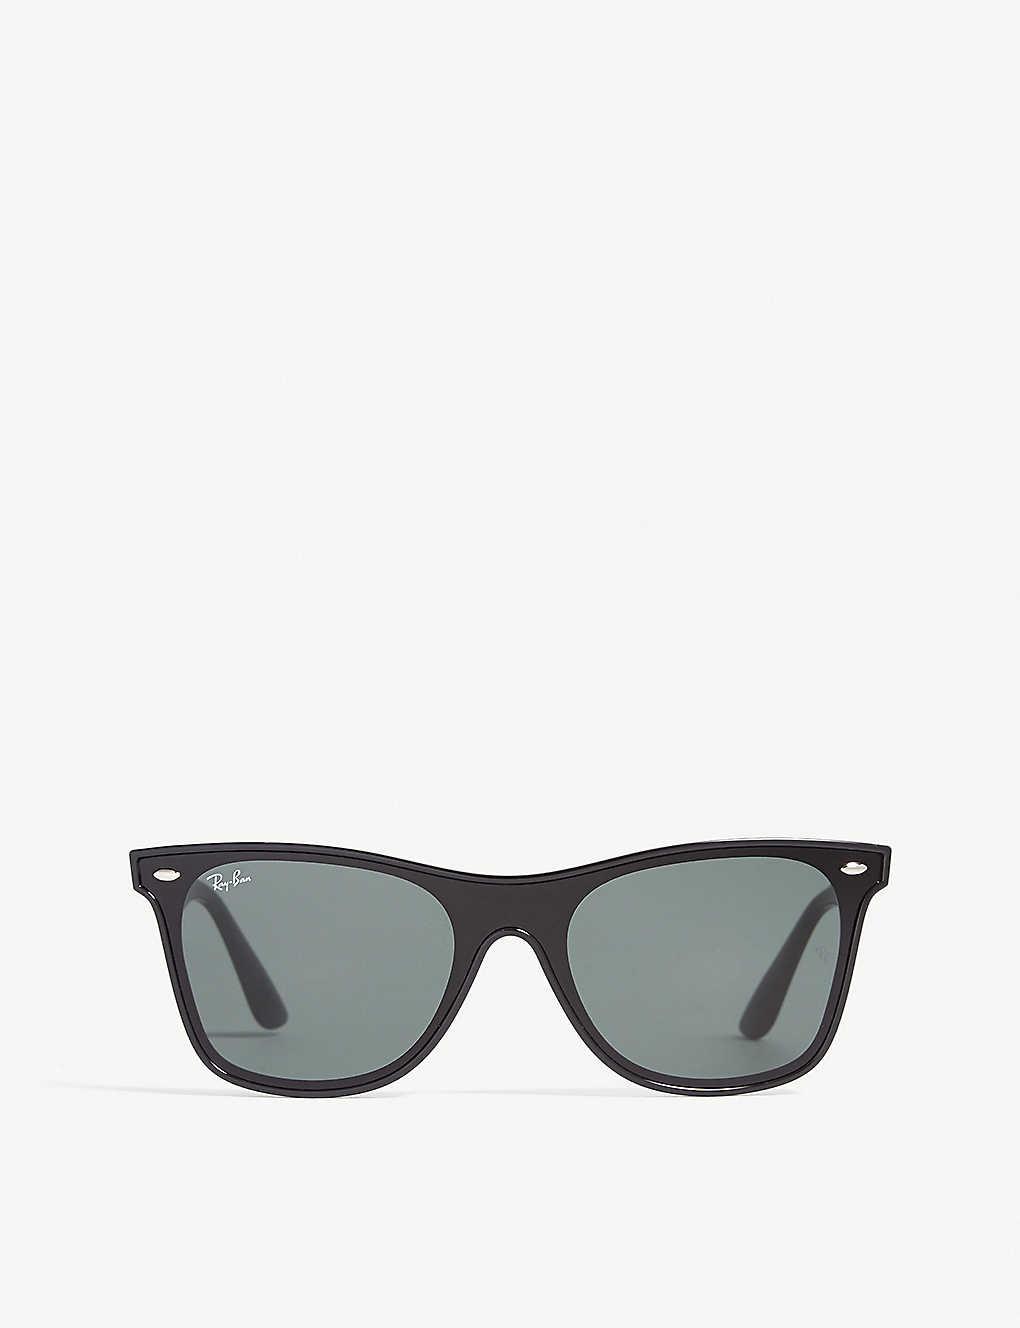 d39affefedf RAY-BAN - RB4440 square-frame sunglasses